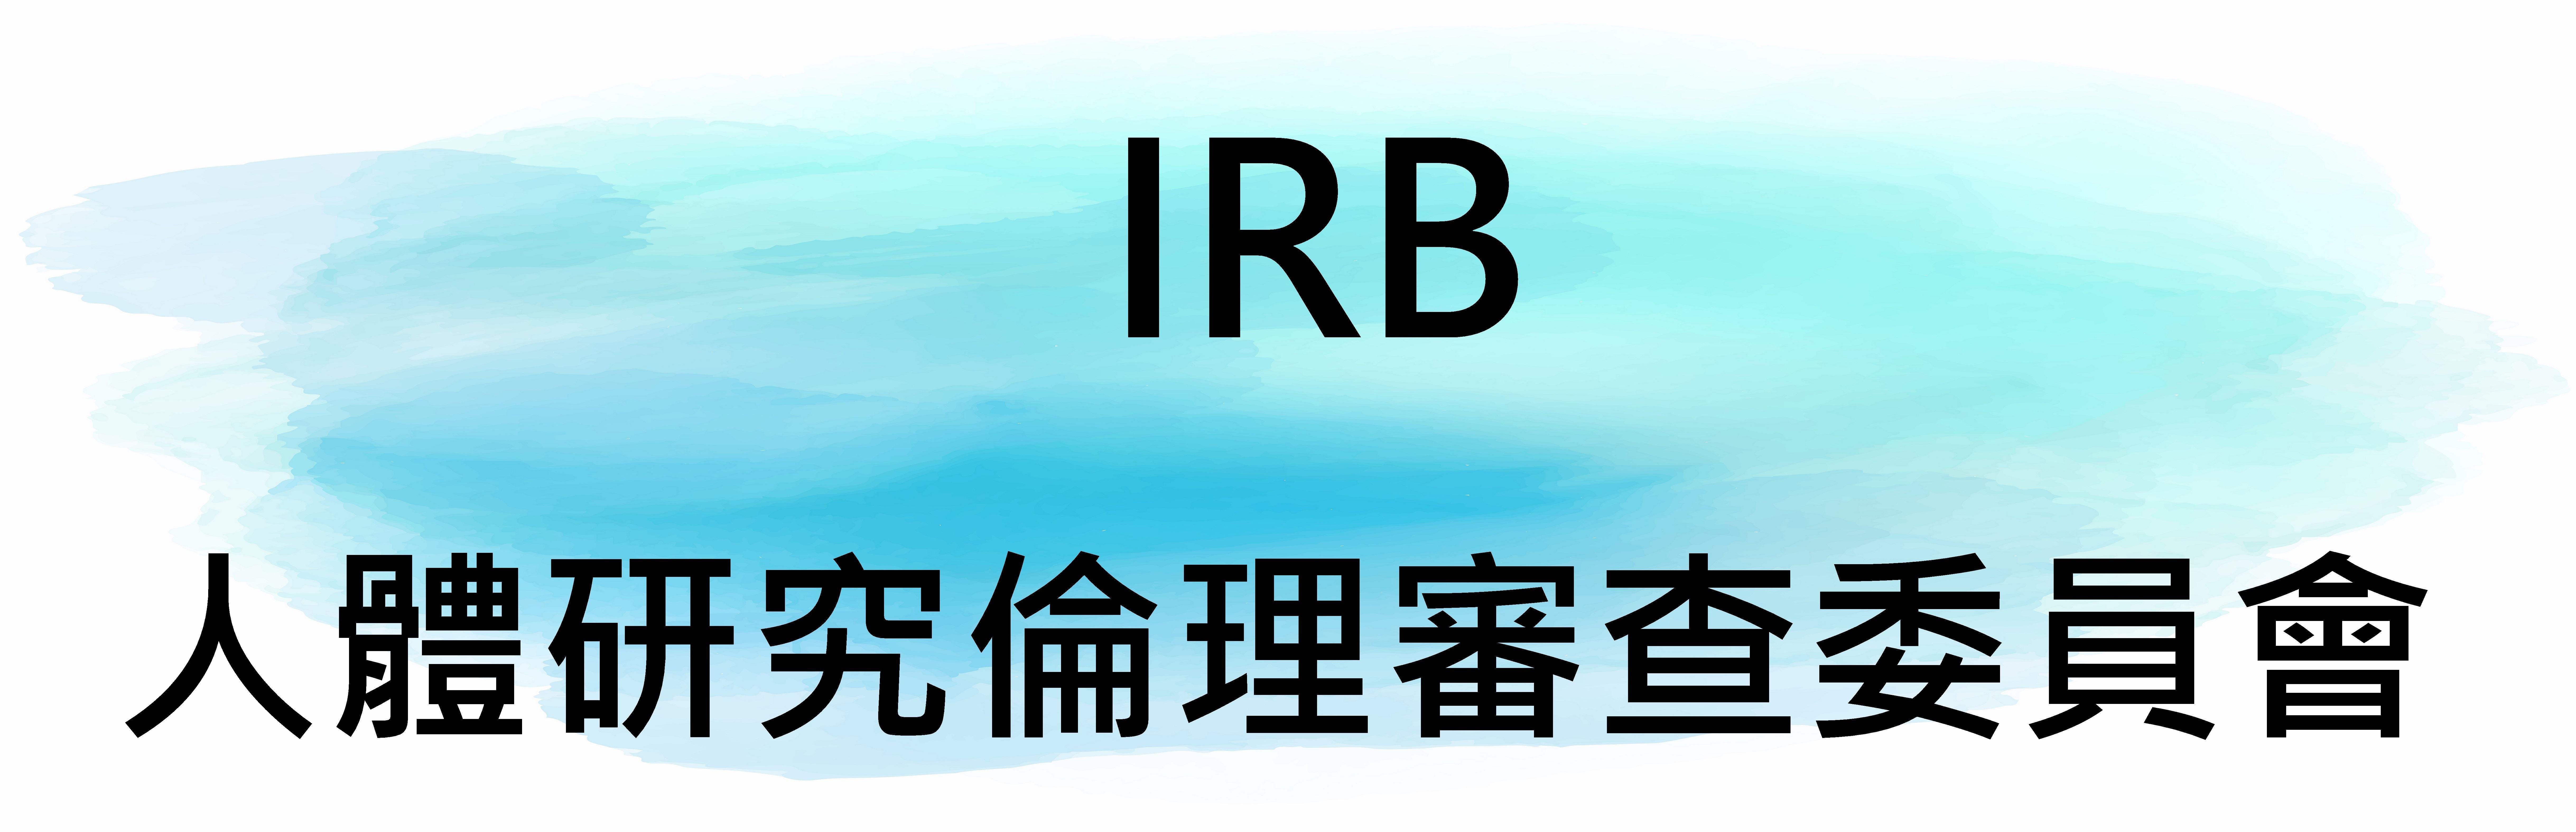 IRB 人體研究倫理審查委員會(圖片)